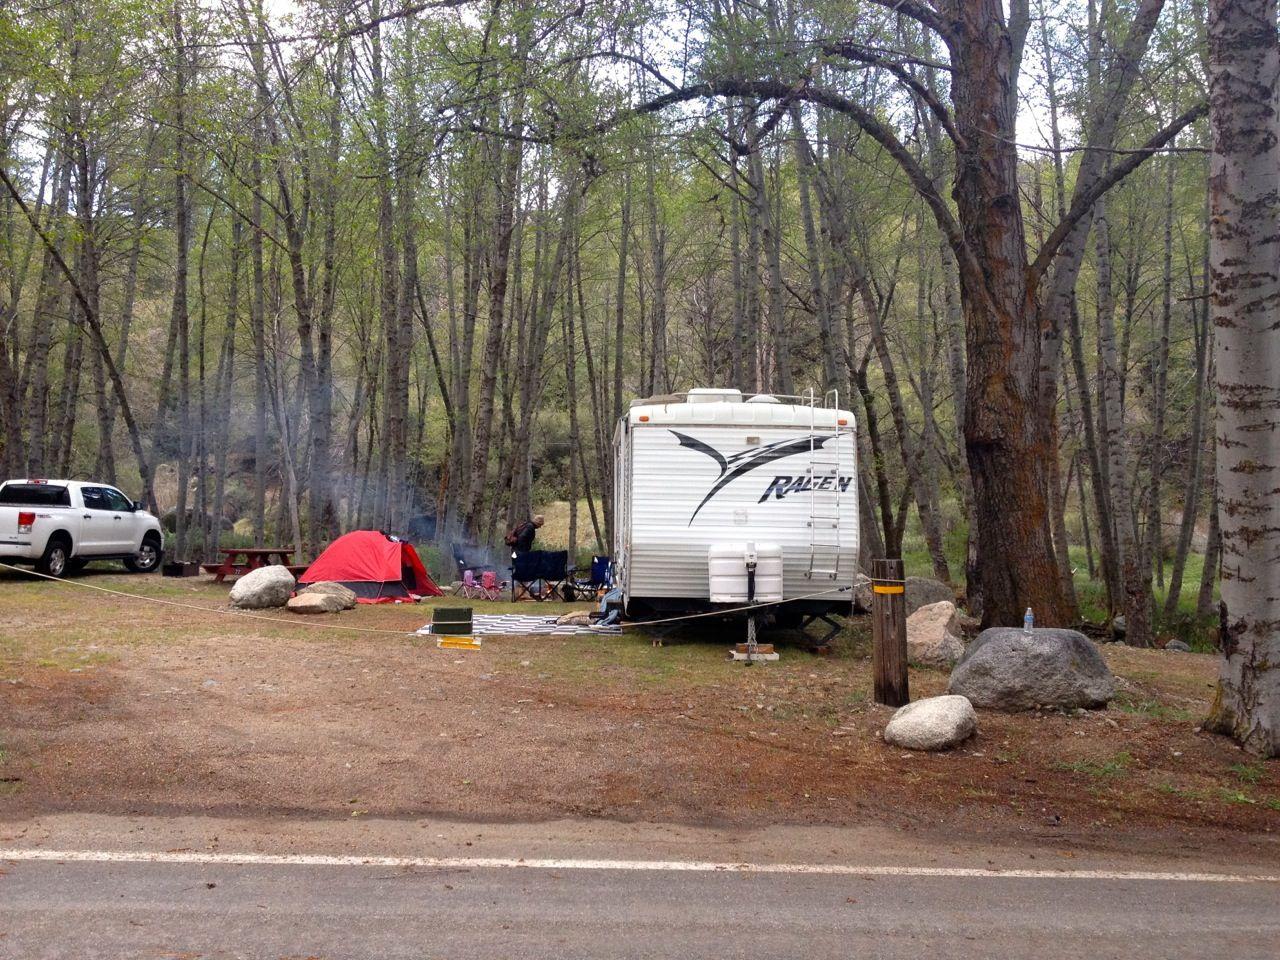 seven oaks mountain resort   places to go/travel   pinterest